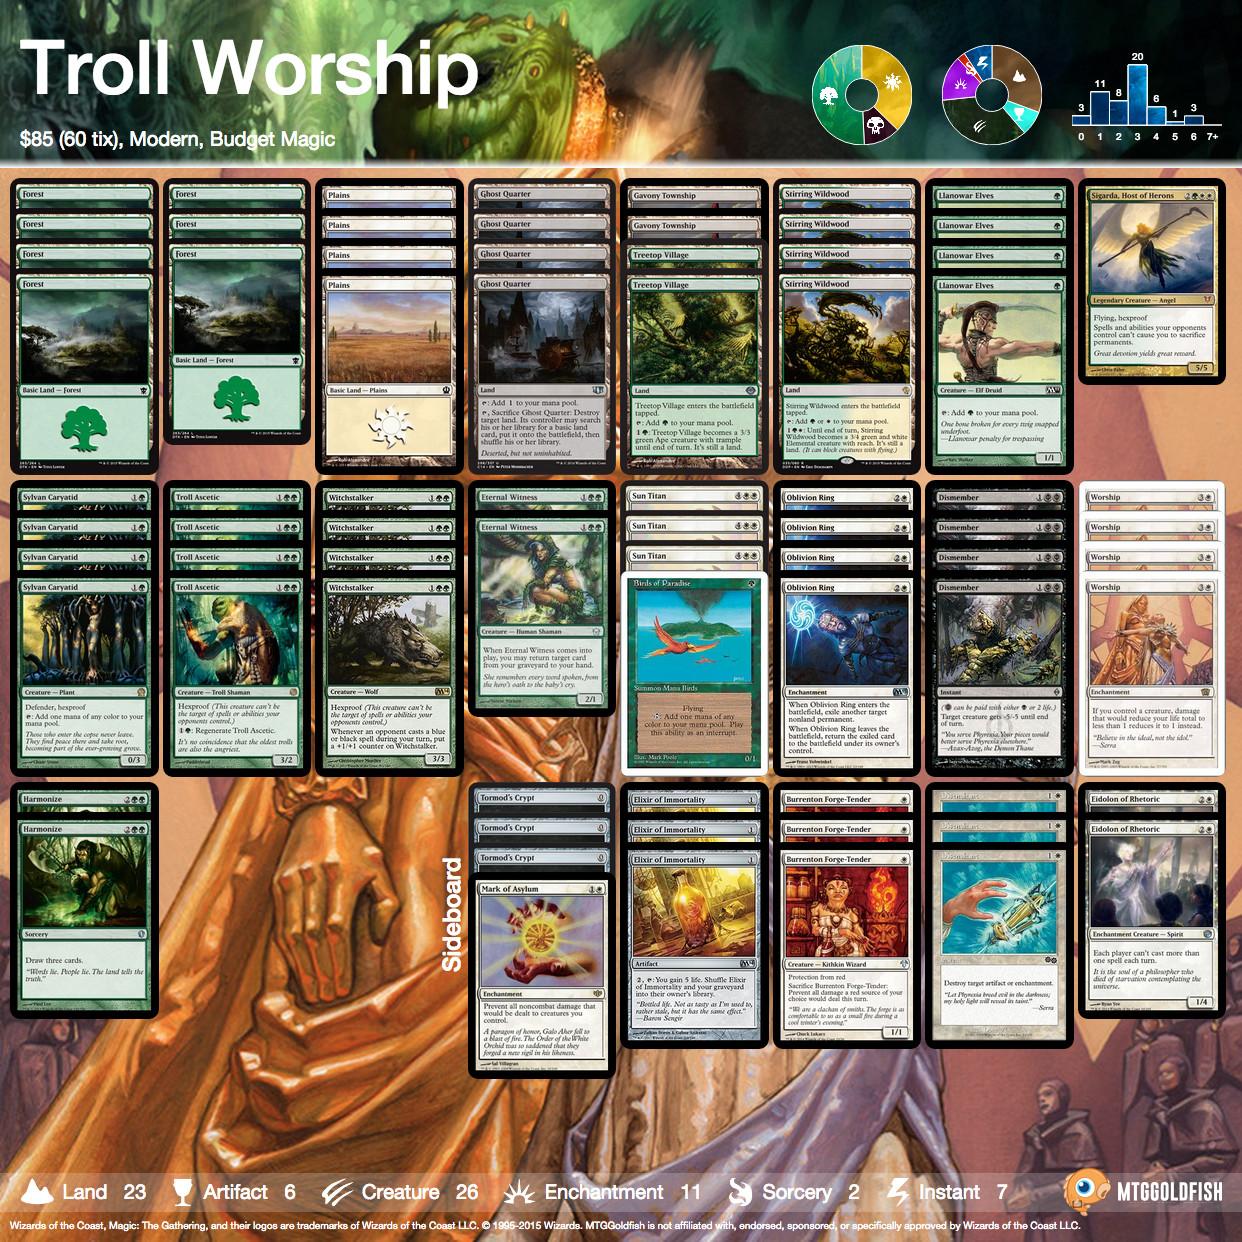 Trollworship